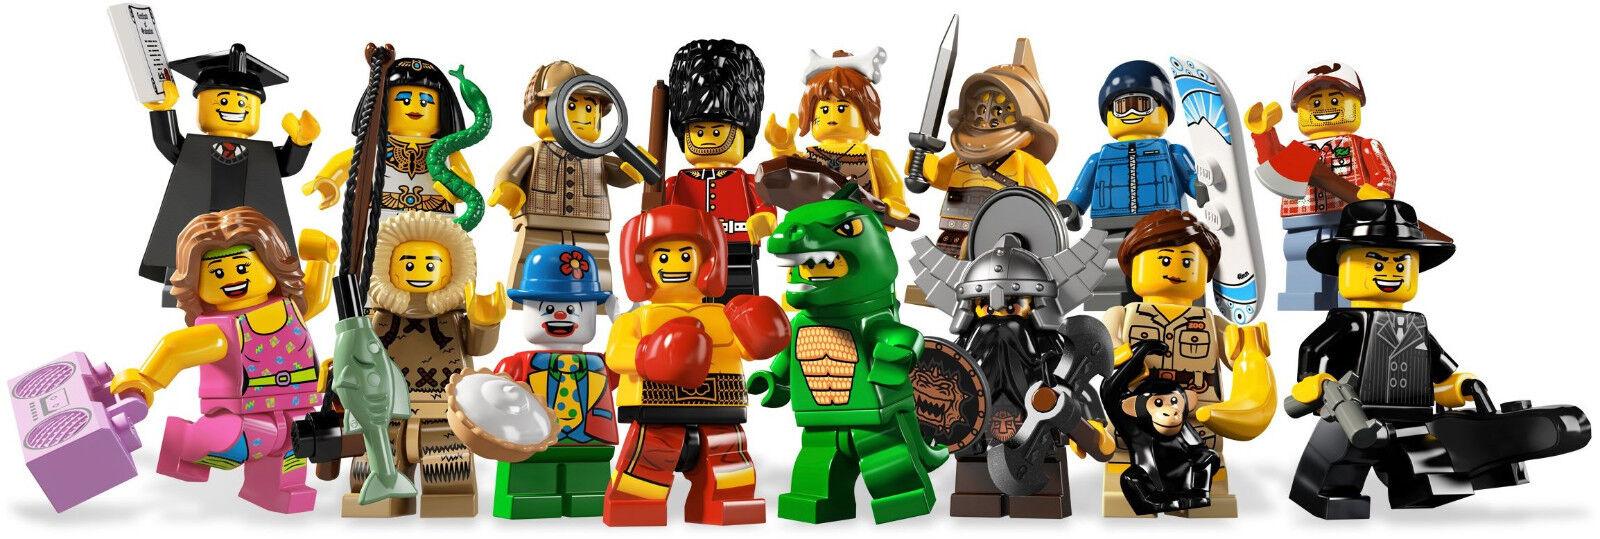 Lego Minifigures - SET 8805 - SERIE 5